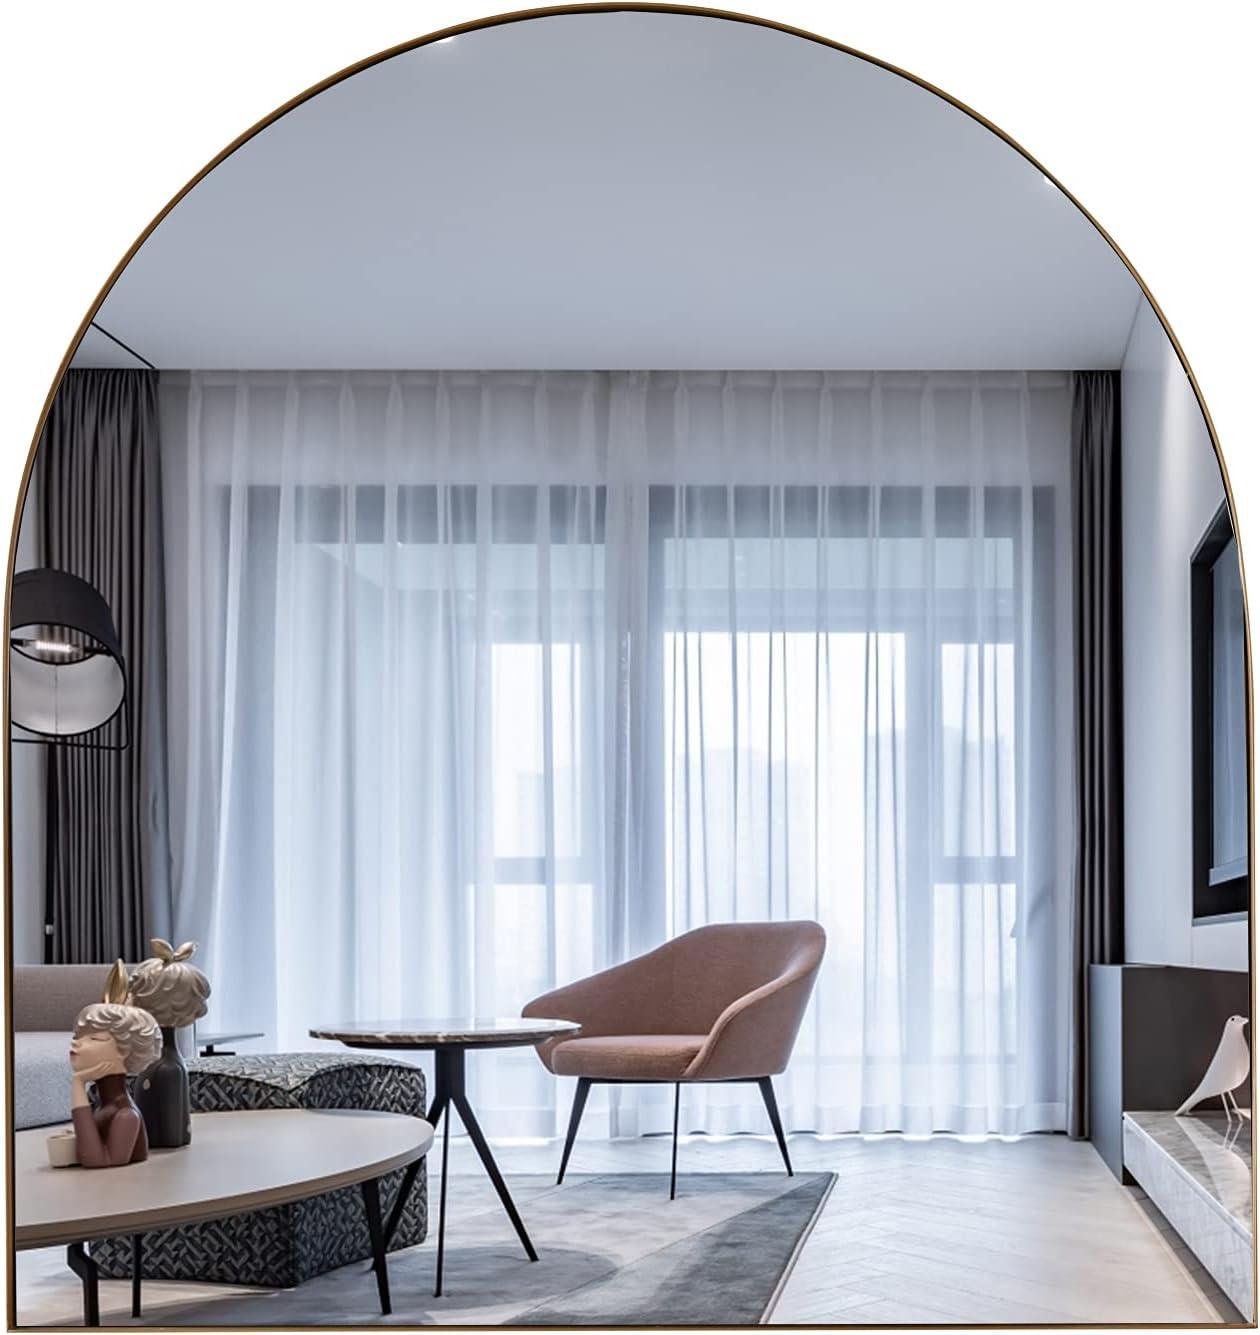 BIKARSOUL Arched Mirror for Wall Decor 31.5